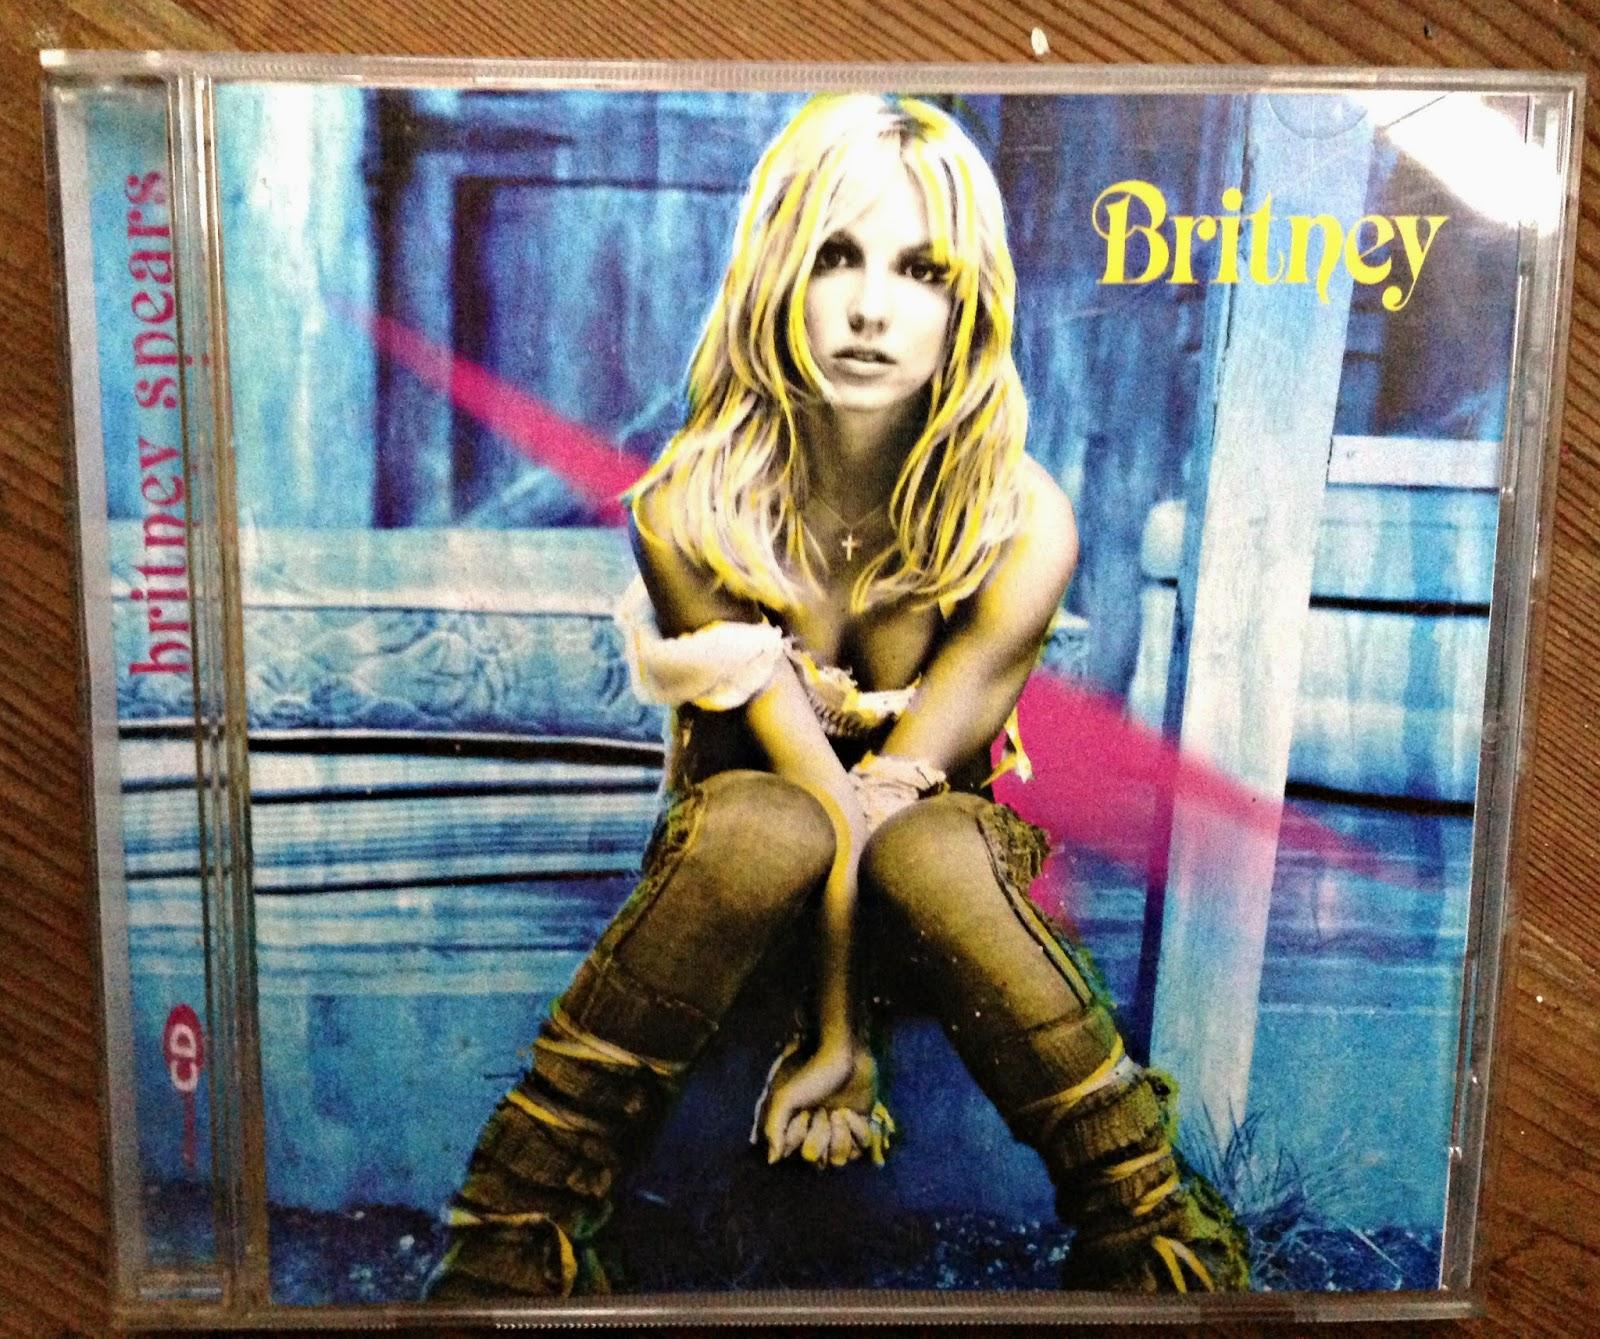 Britney Spears- Britney